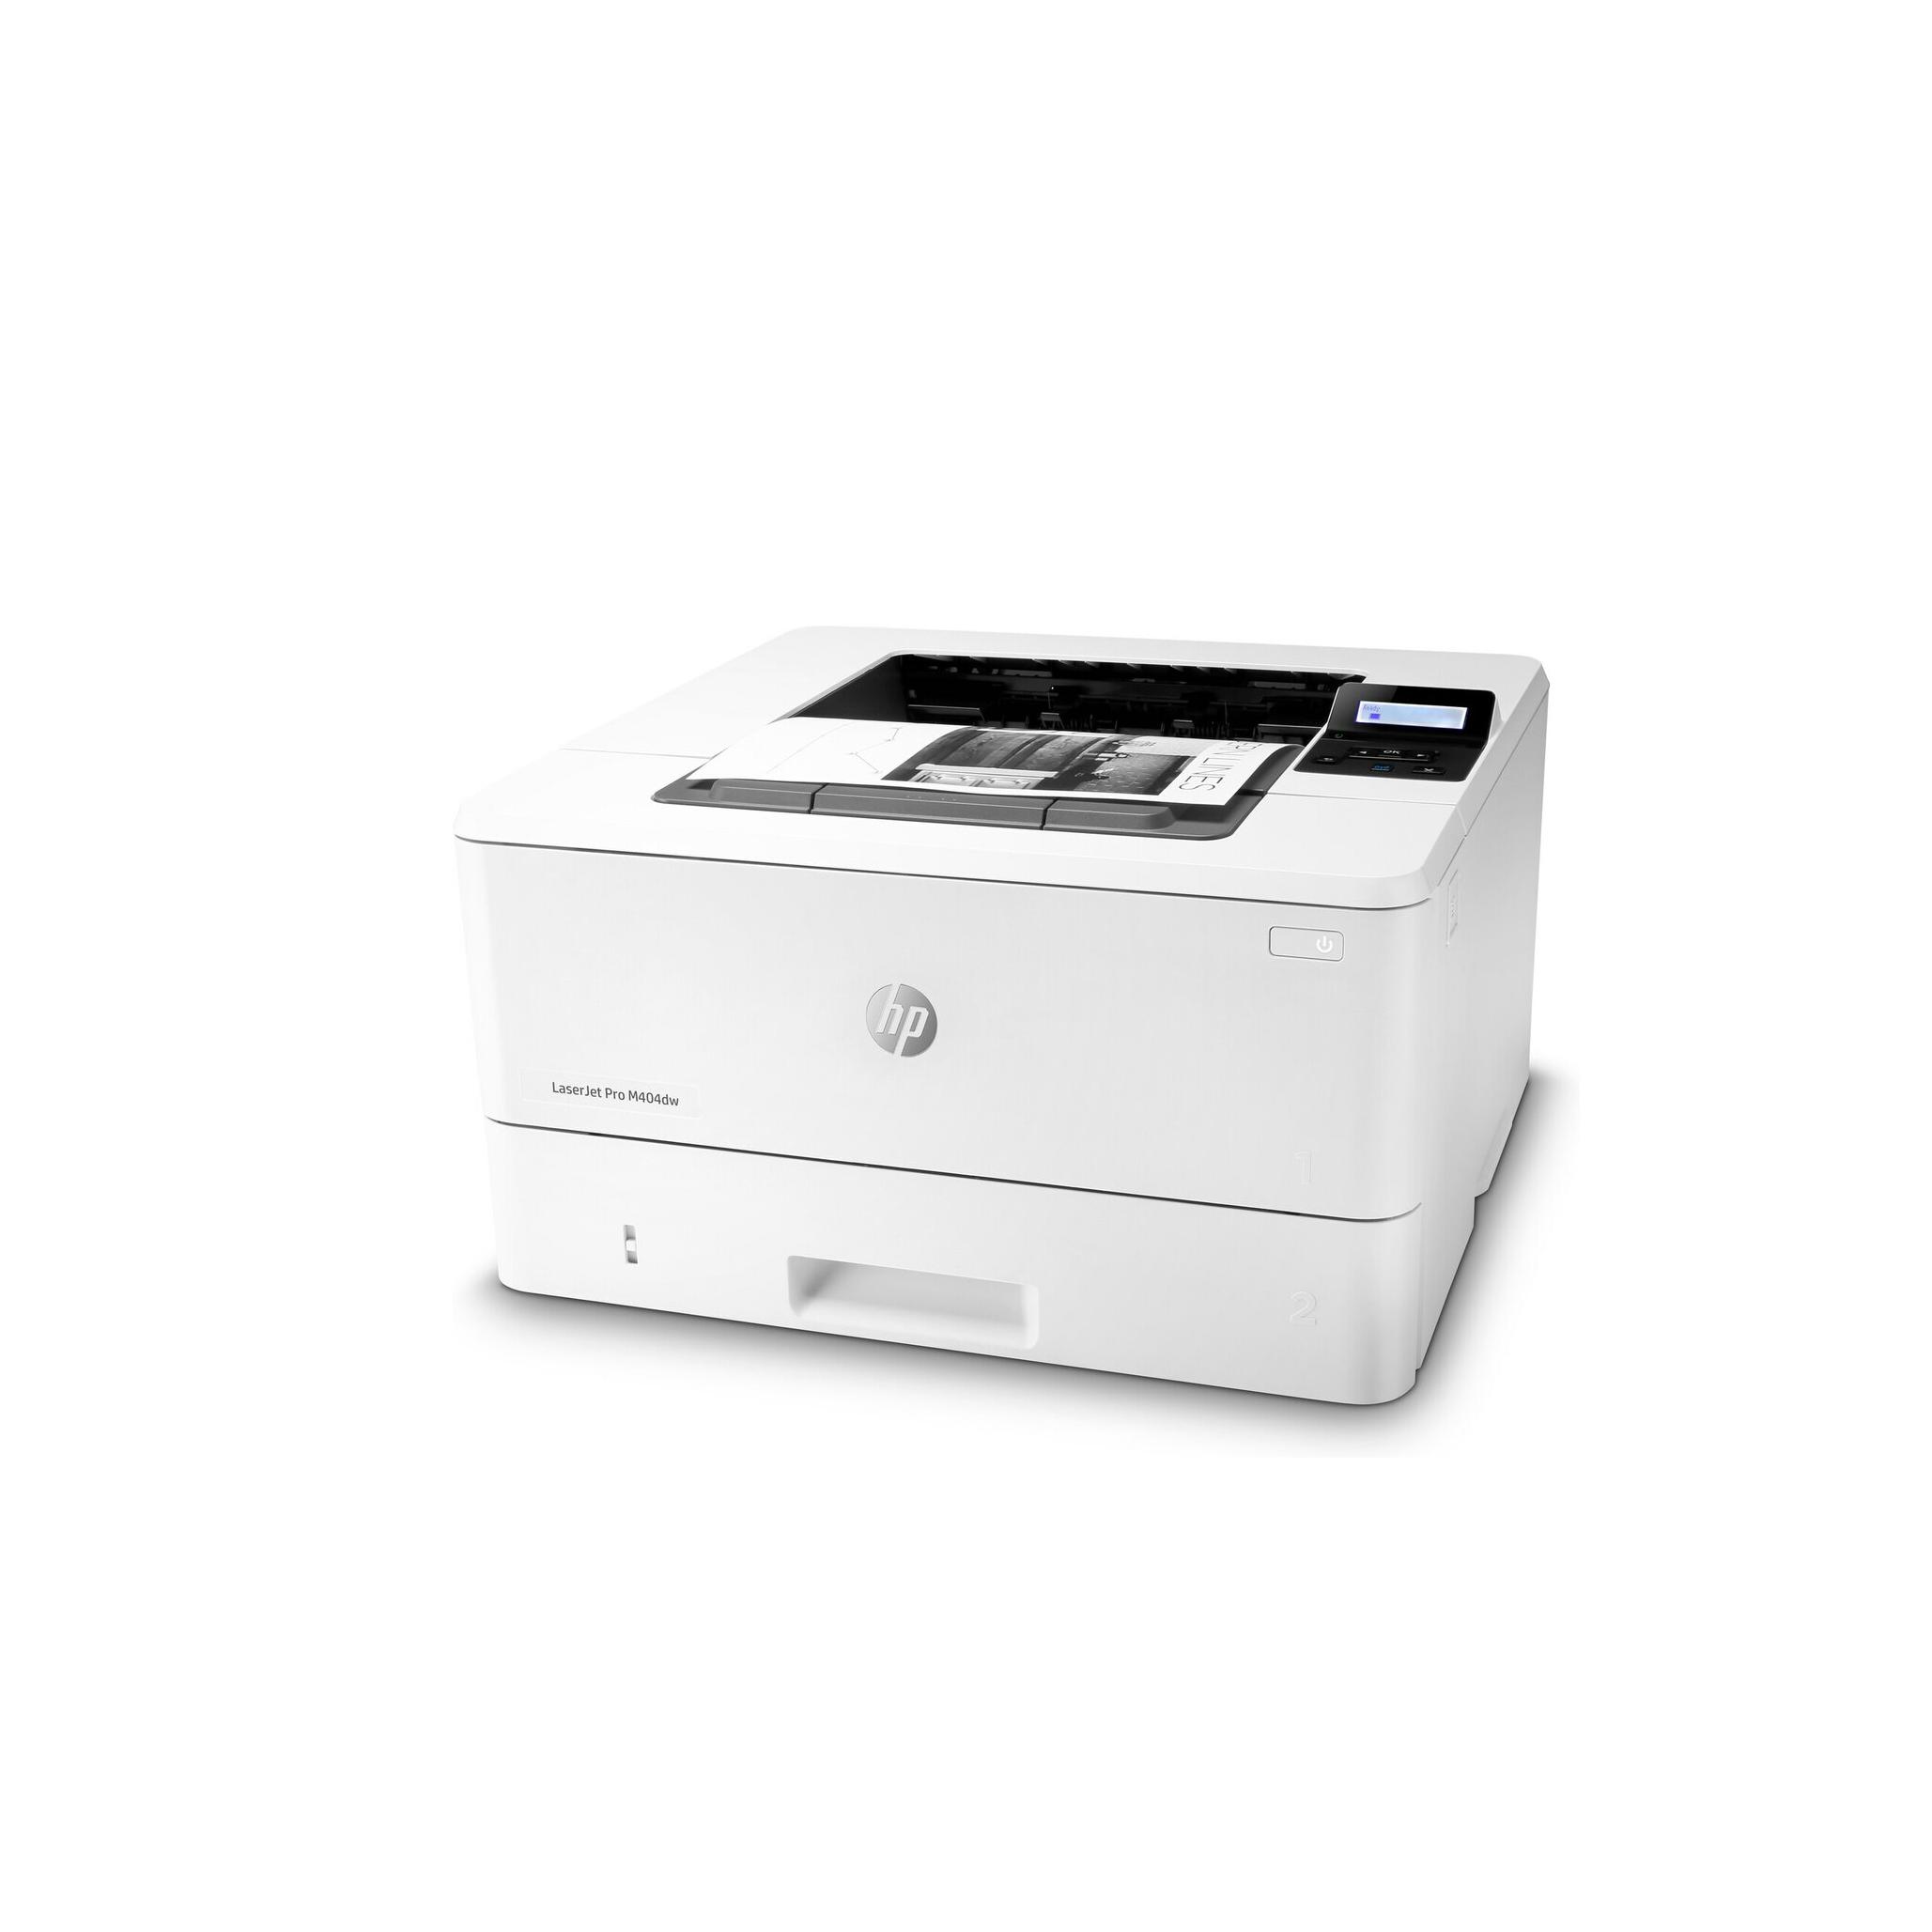 Принтер LaserJet Pro M404dw B W1A56A